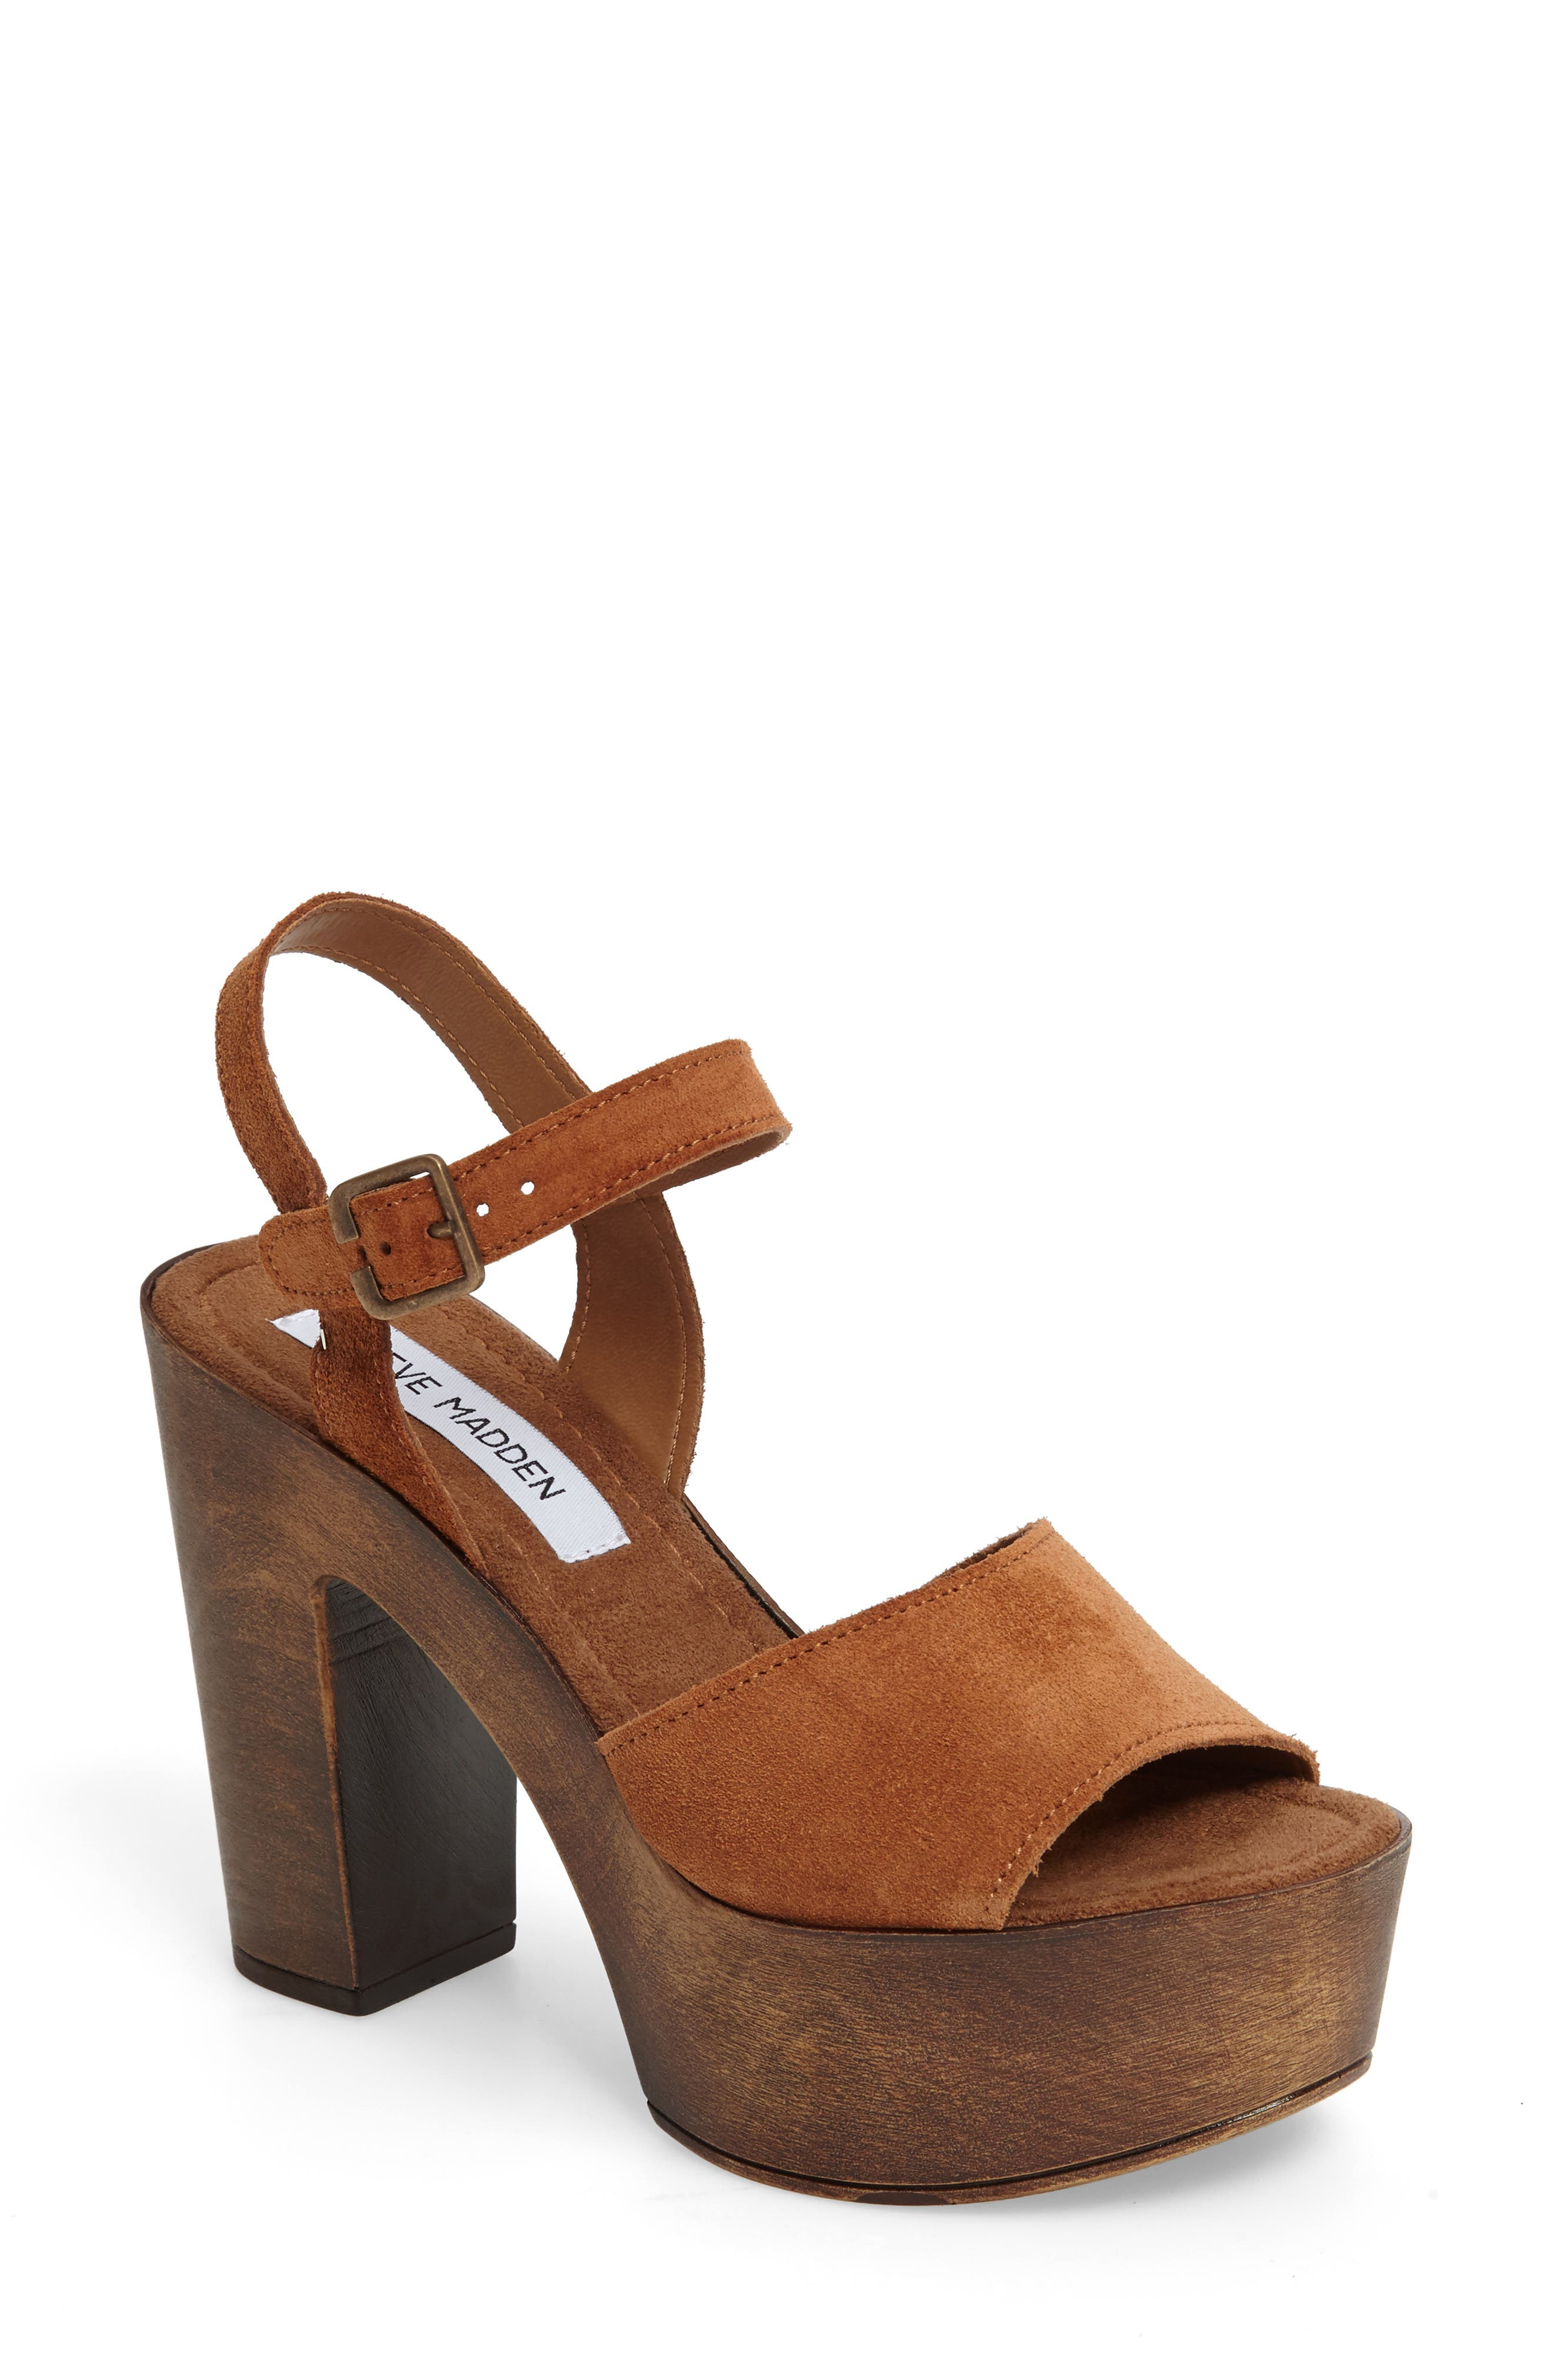 Lulla Platform Sandal,                             Main thumbnail 4, color,